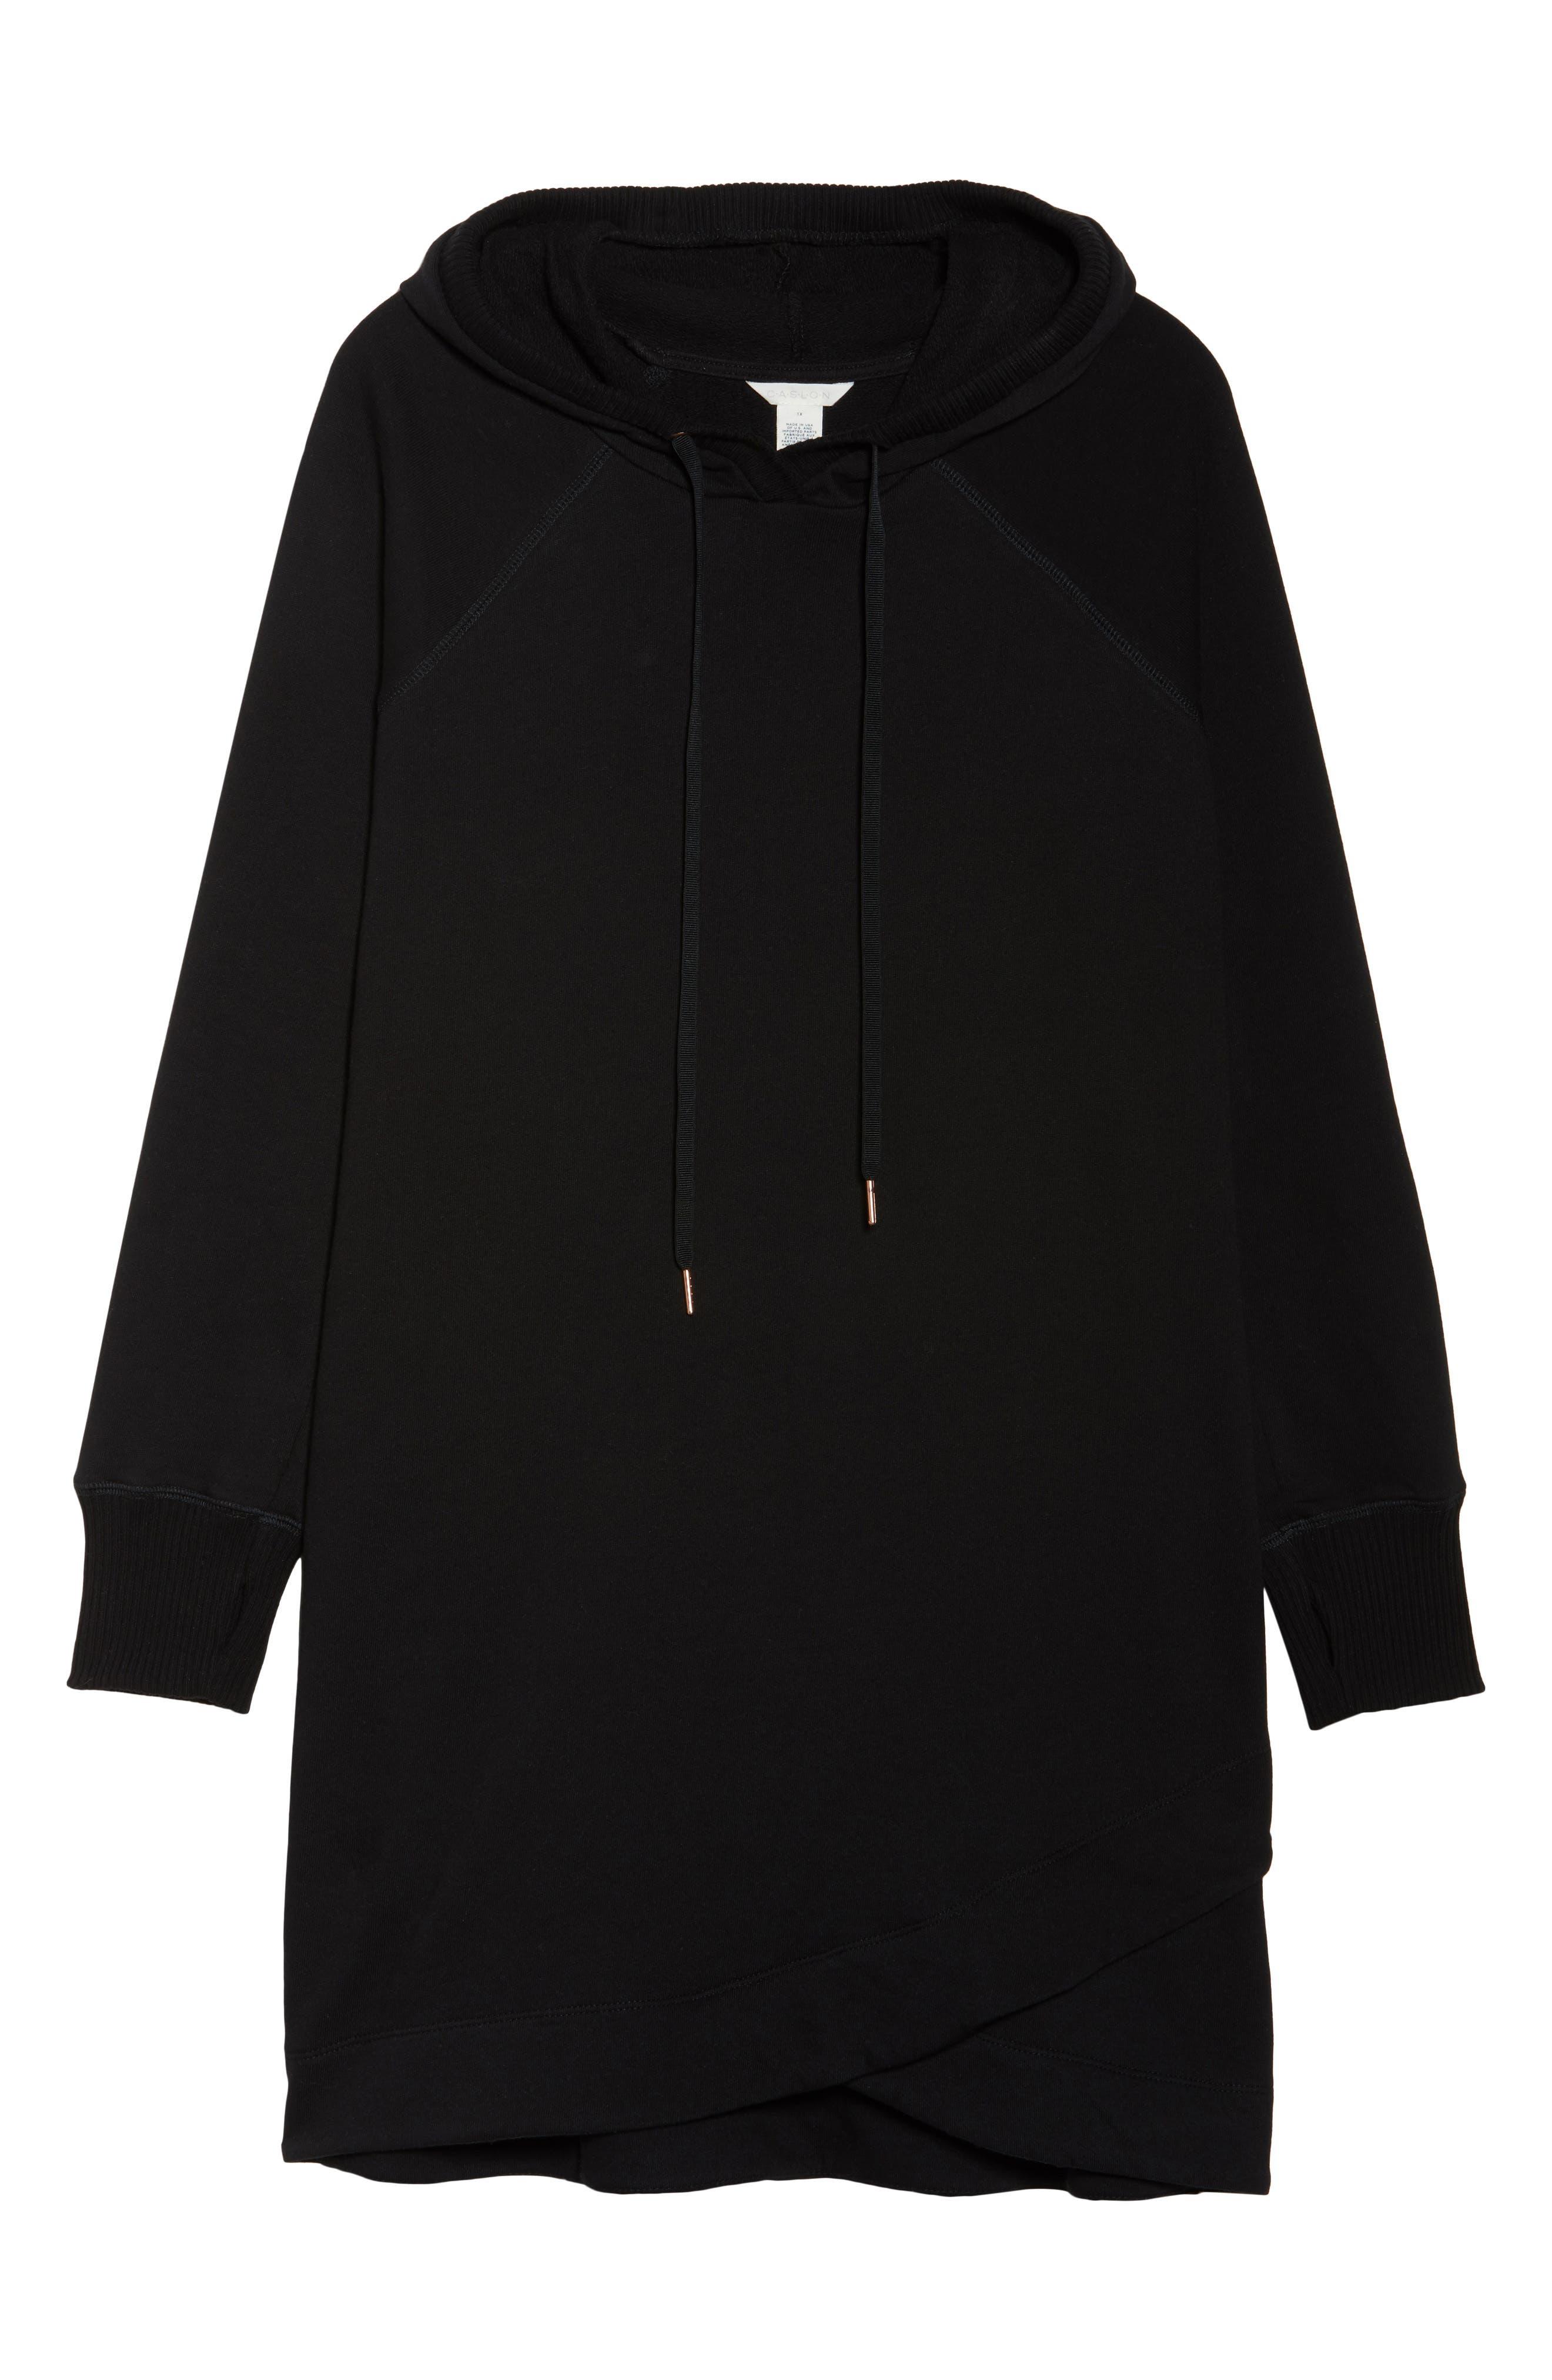 Off-Duty Hooded Sweatshirt Dress,                             Alternate thumbnail 6, color,                             Black